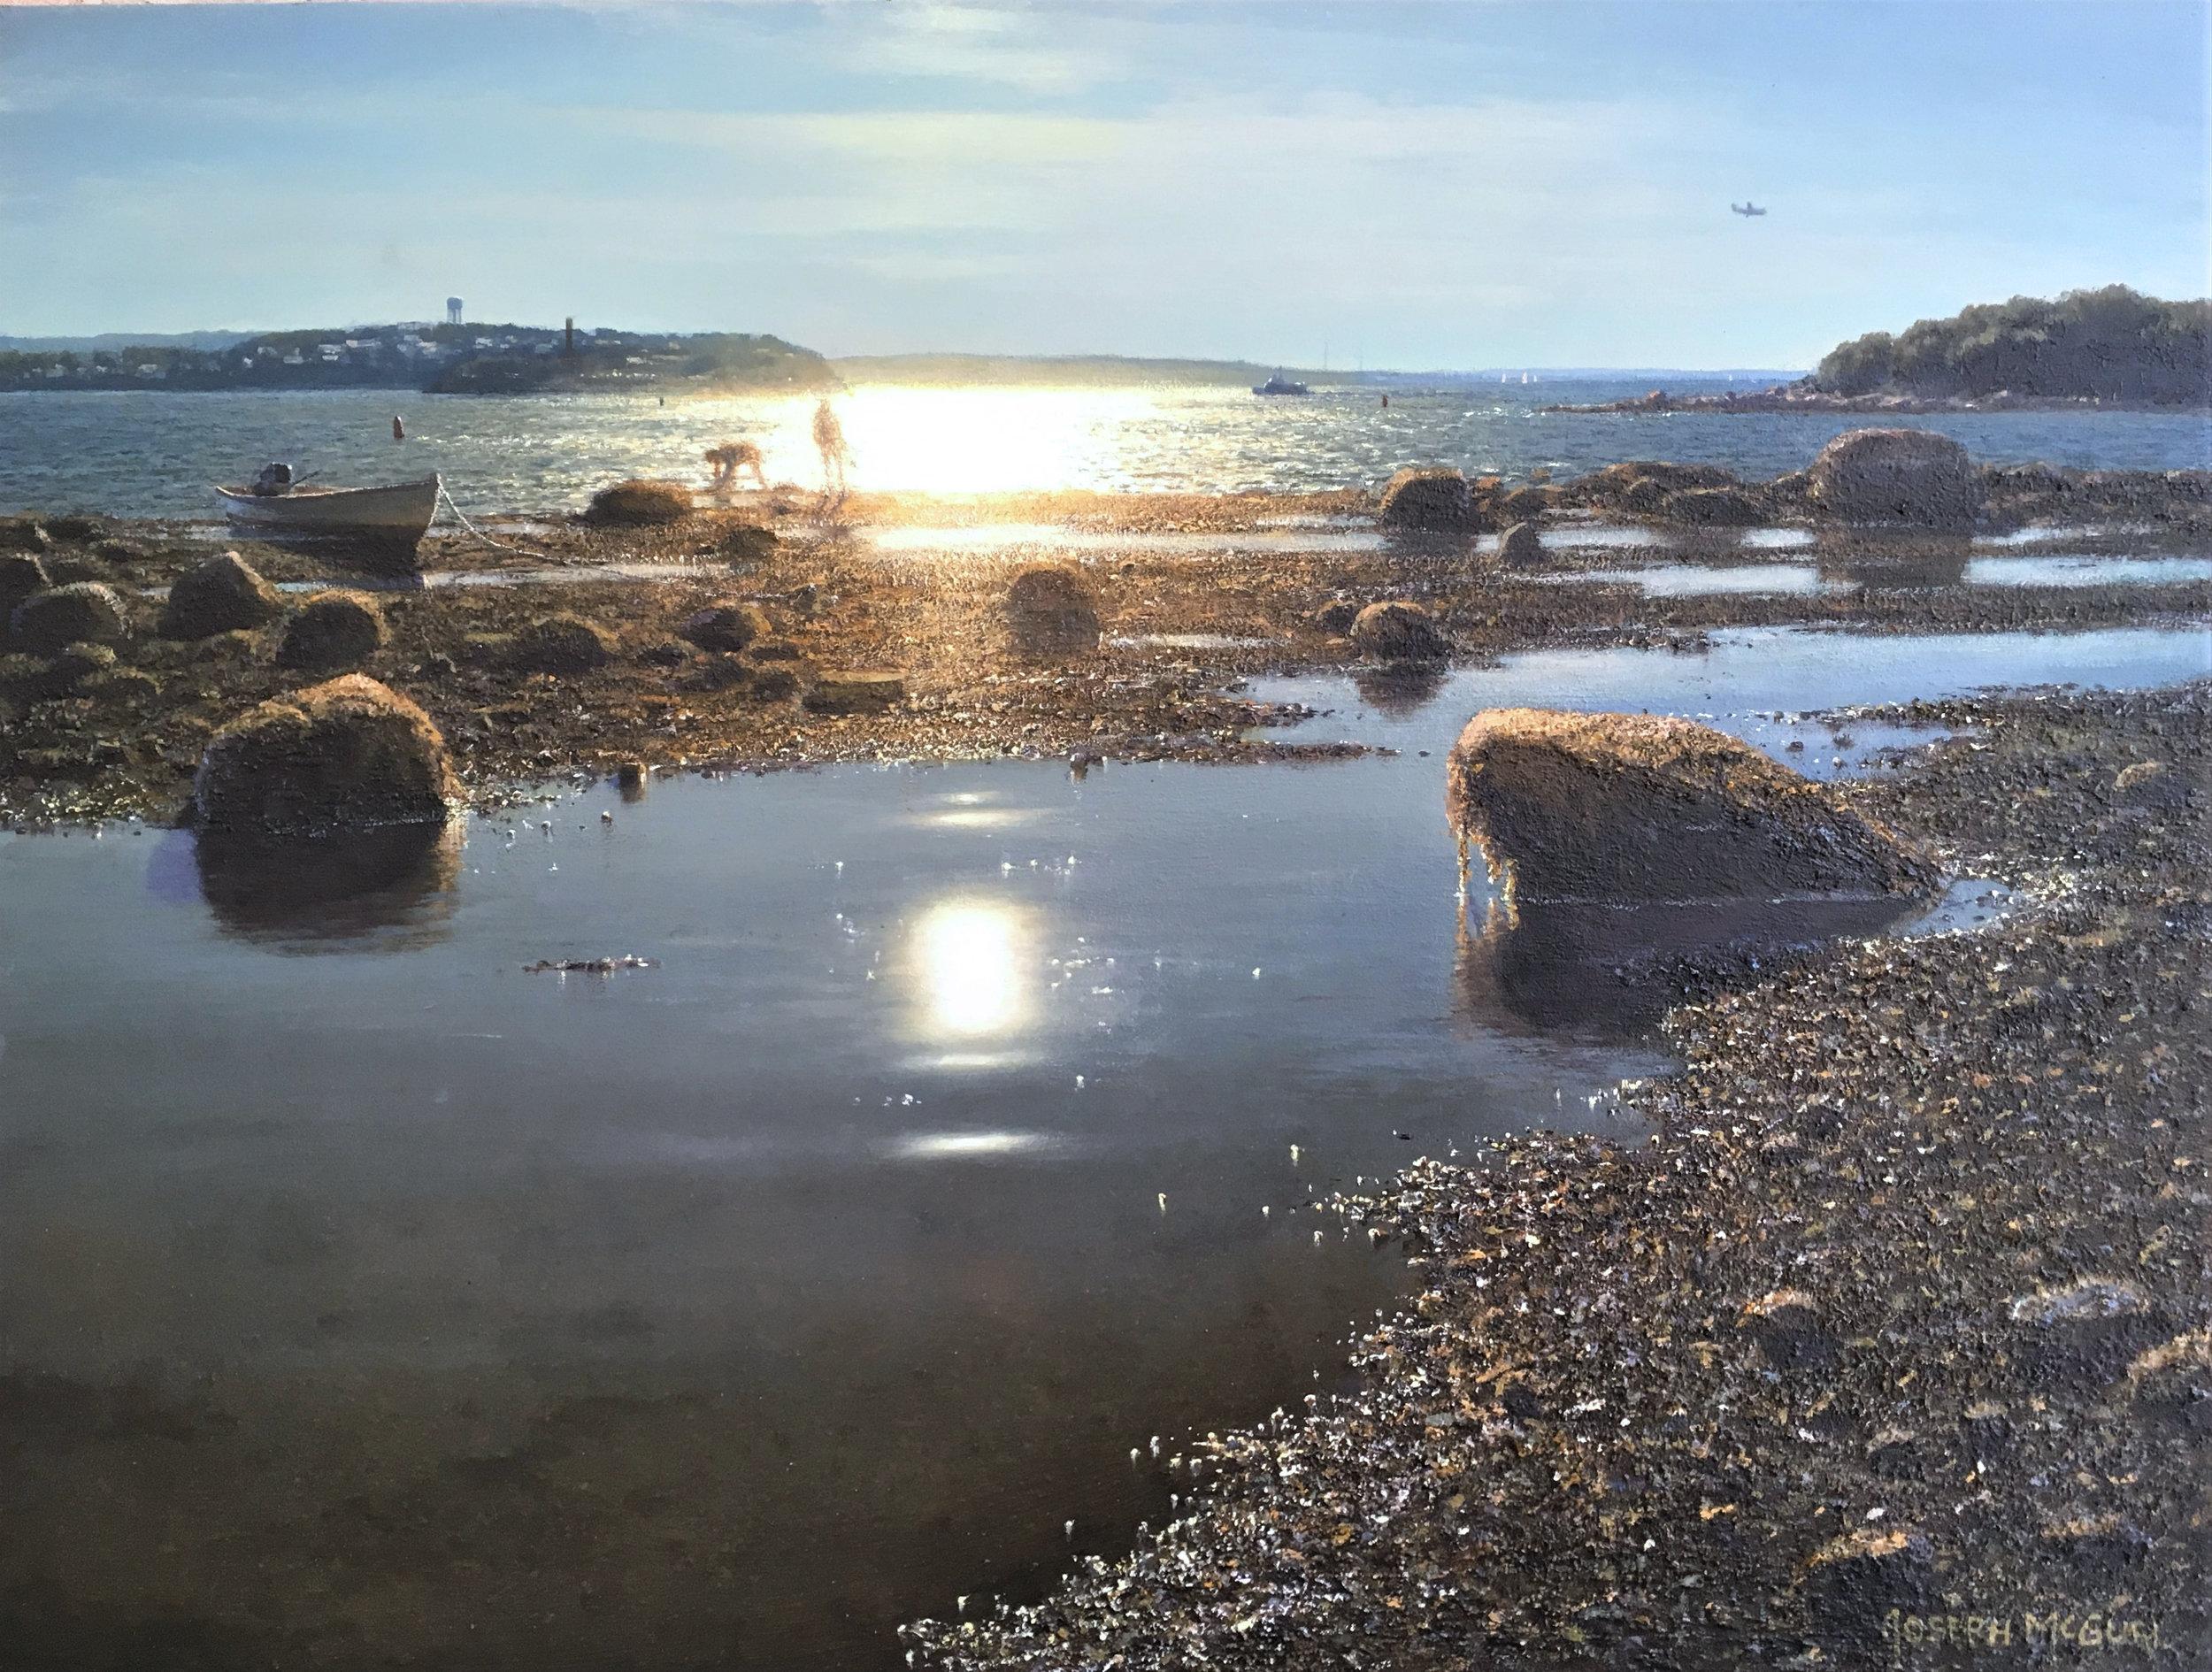 The Boston Harbor Islands Project, Clamdiggers